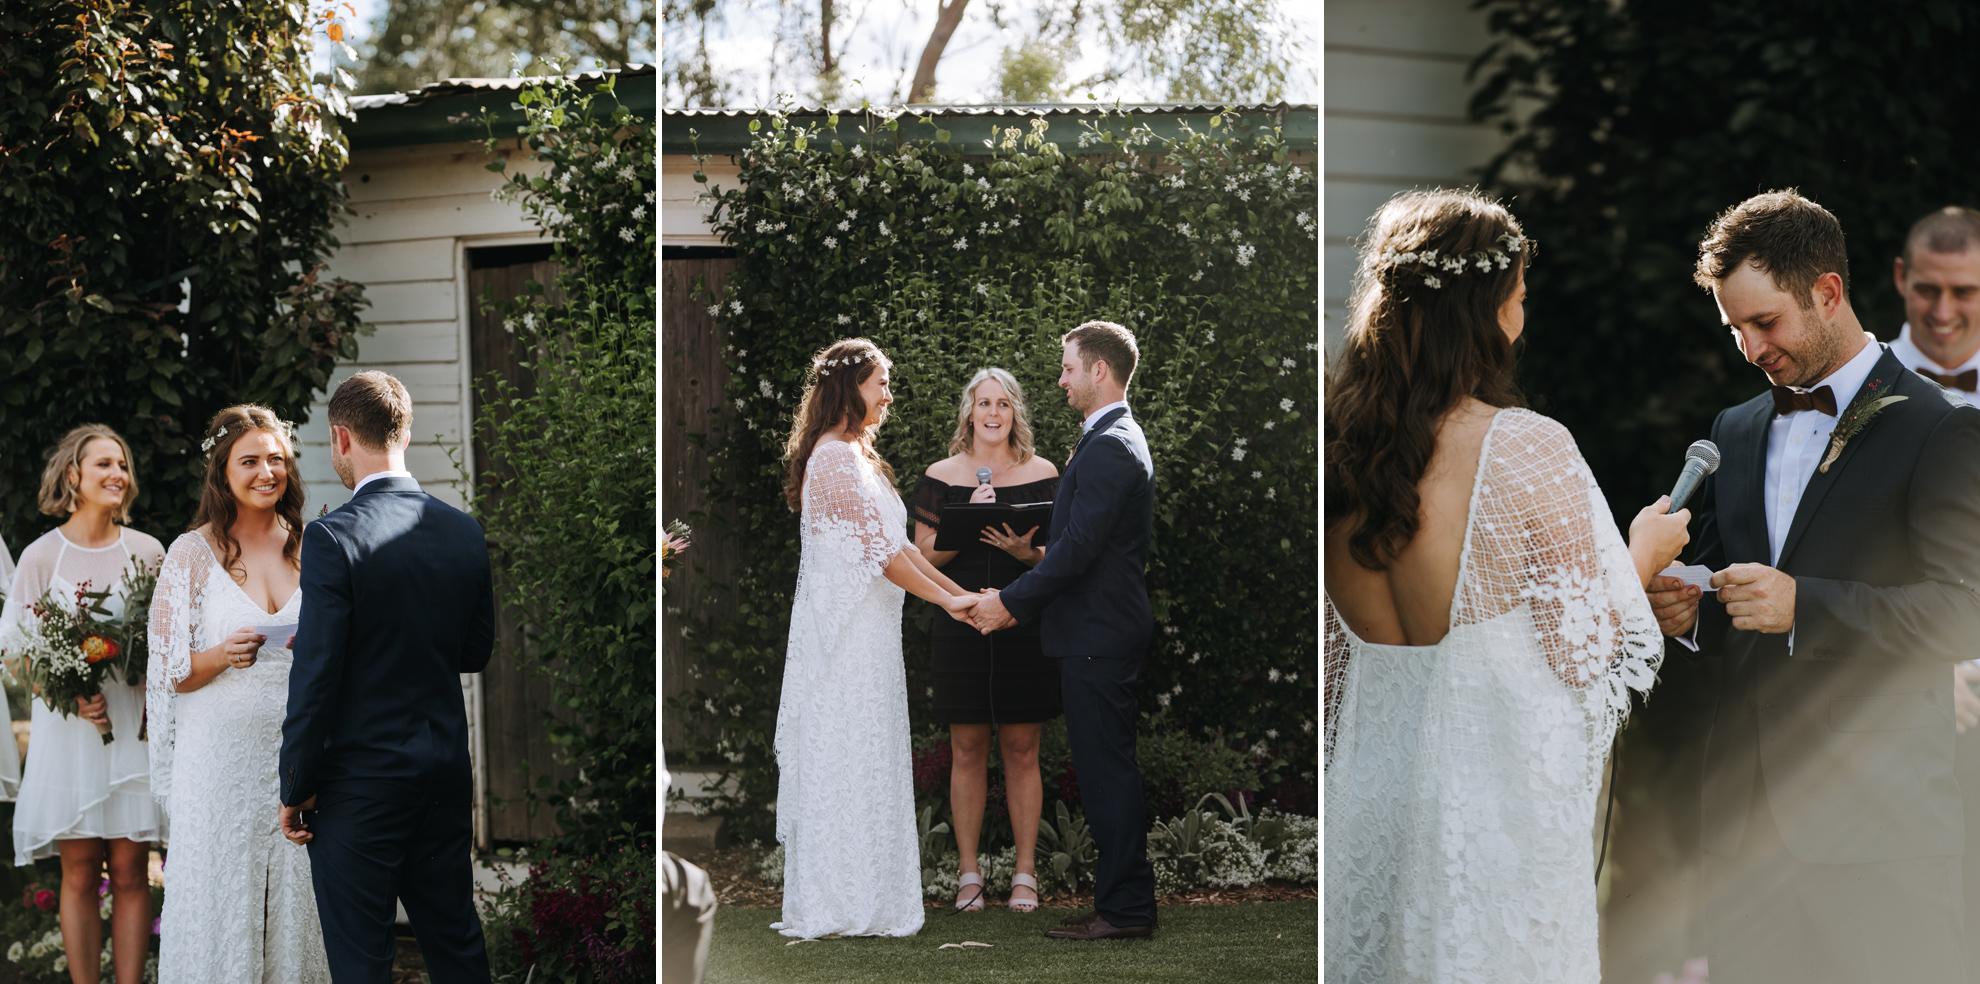 040-Jason_Jessie_Dalby_Country_Wedding.jpg